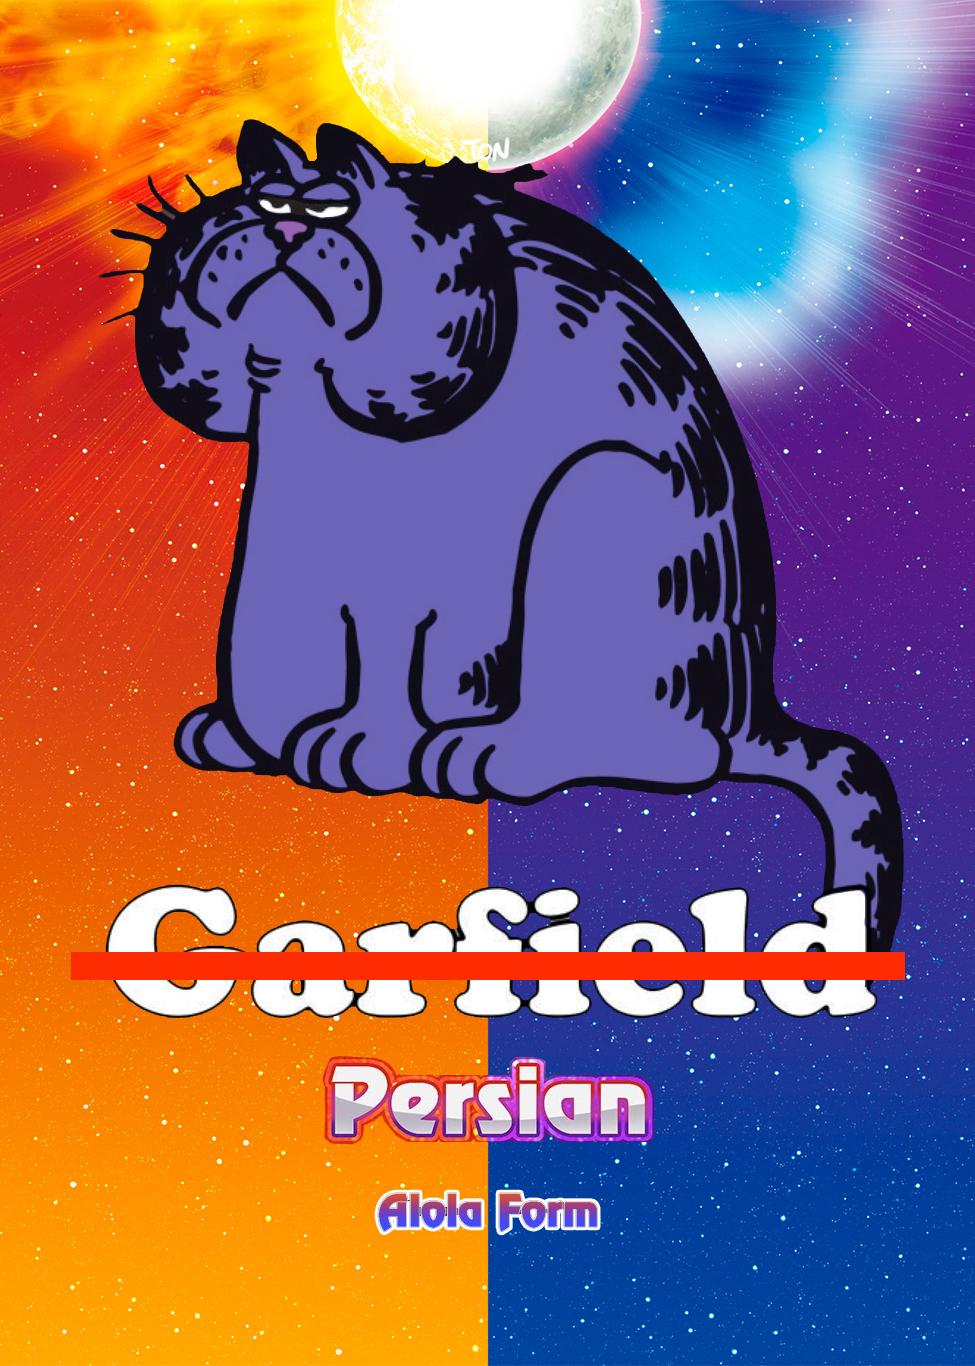 Persian Alola form by TonAlleks on DeviantArt